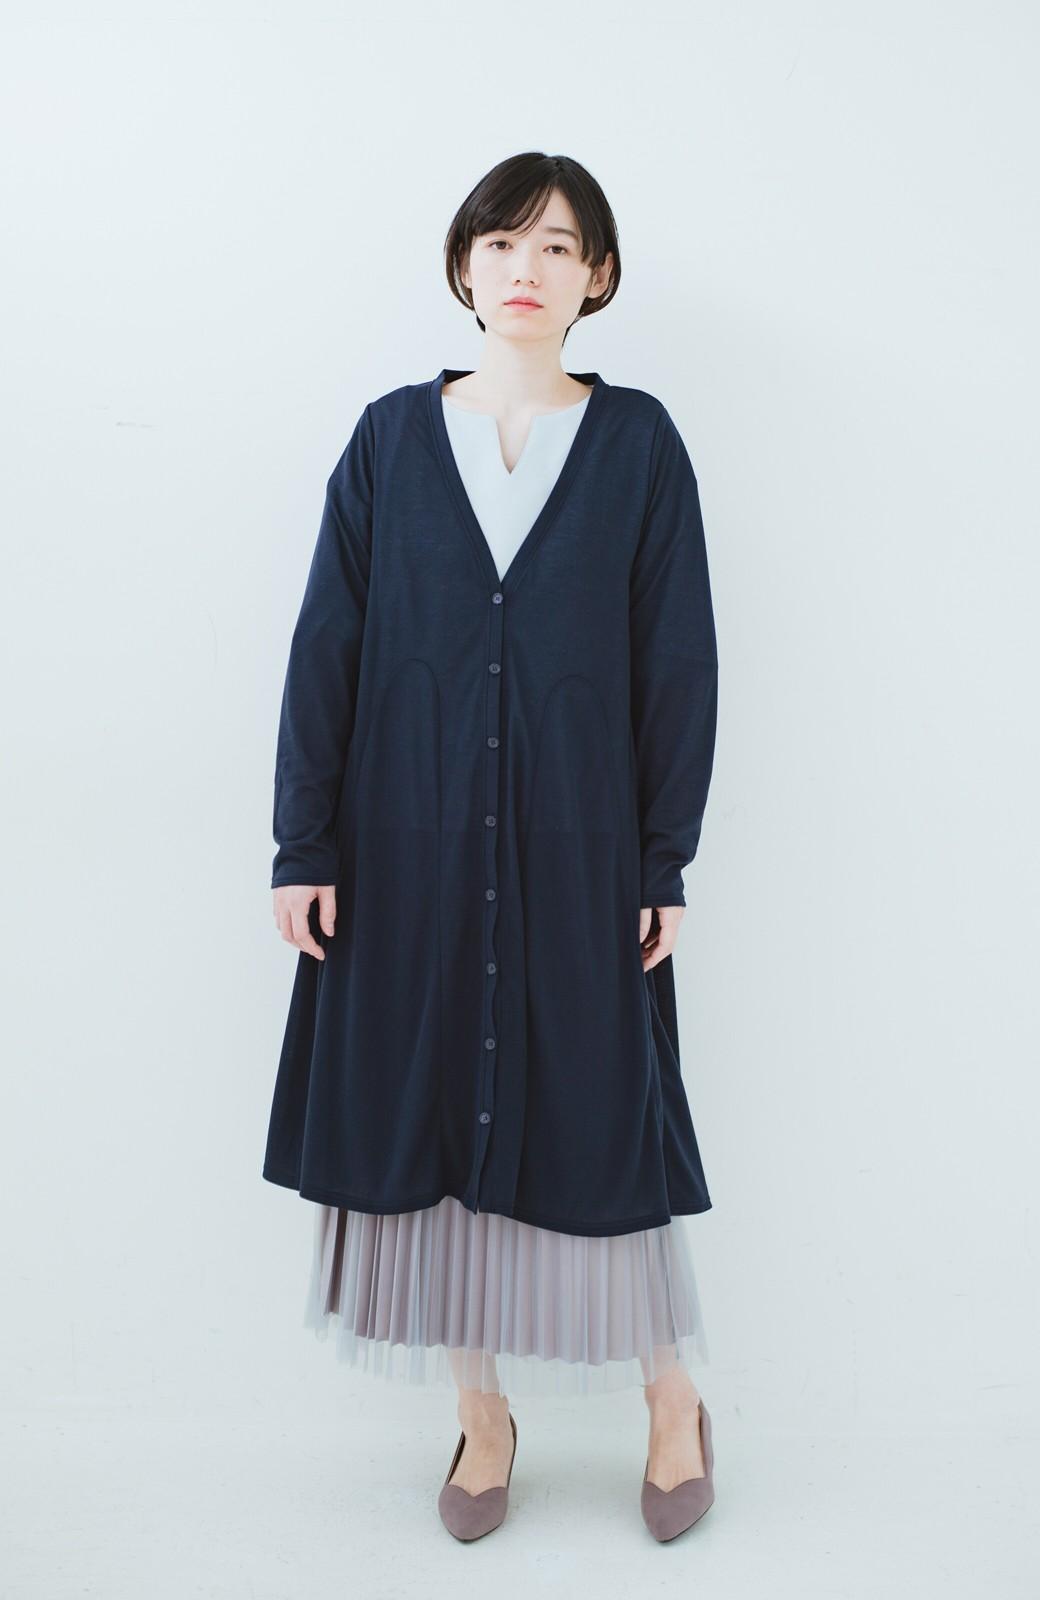 haco! どんな日も華やか気分にしてくれる 二枚仕立てのチュールプリーツスカート <ライトグレー>の商品写真17